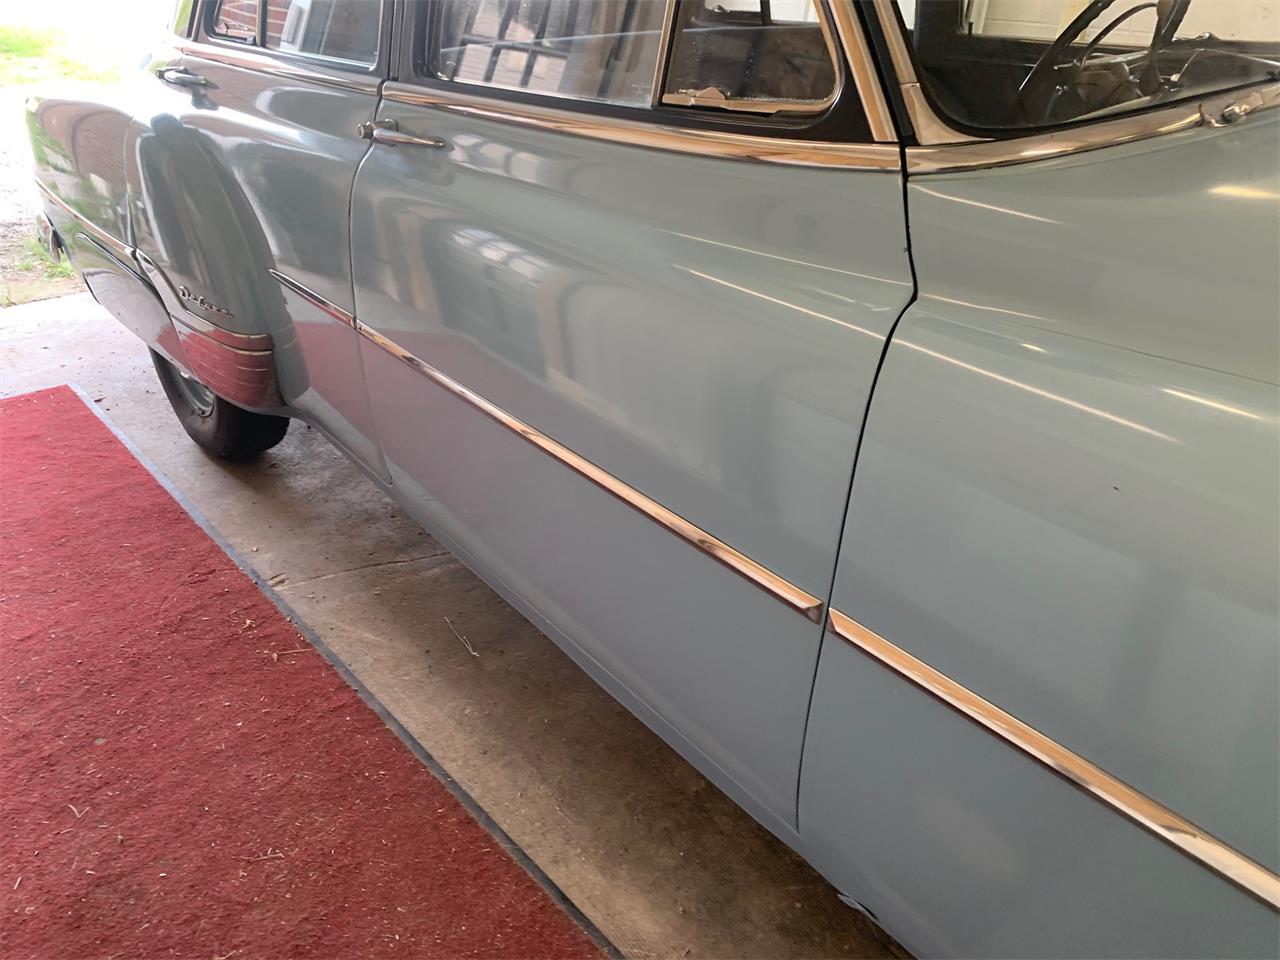 1952 Chevrolet Styleline Deluxe (CC-1392618) for sale in Port Clinton, Ohio